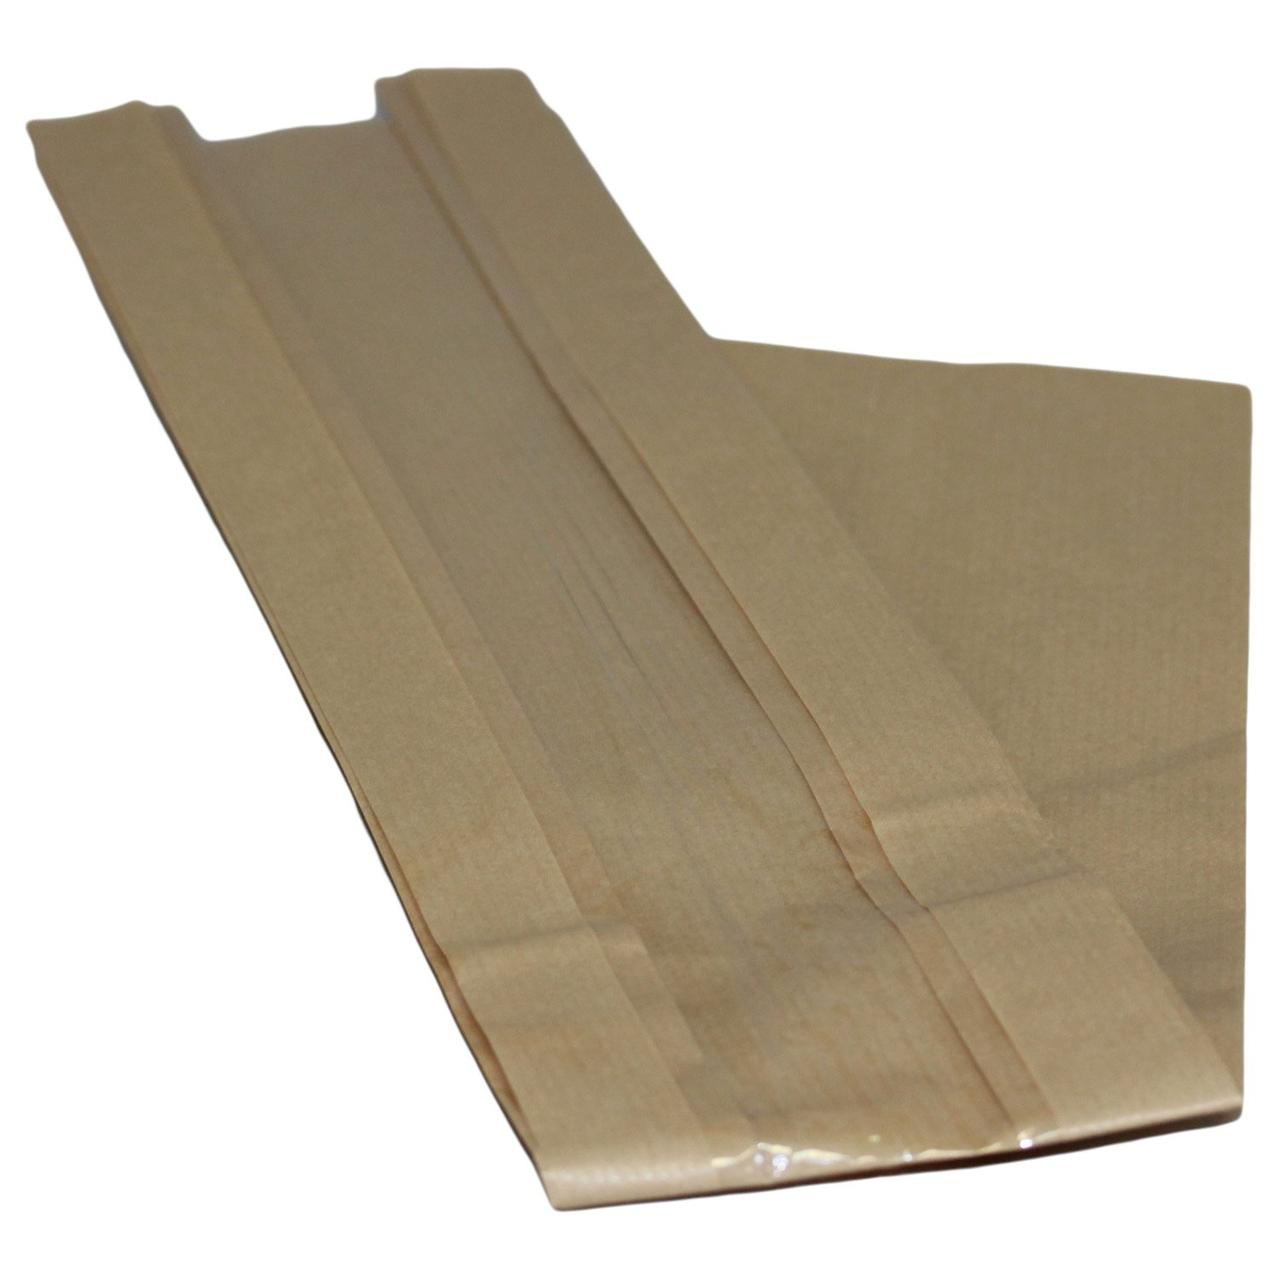 Пакет с окном бежевый без печати (100+50)х590 мм, 2000 шт